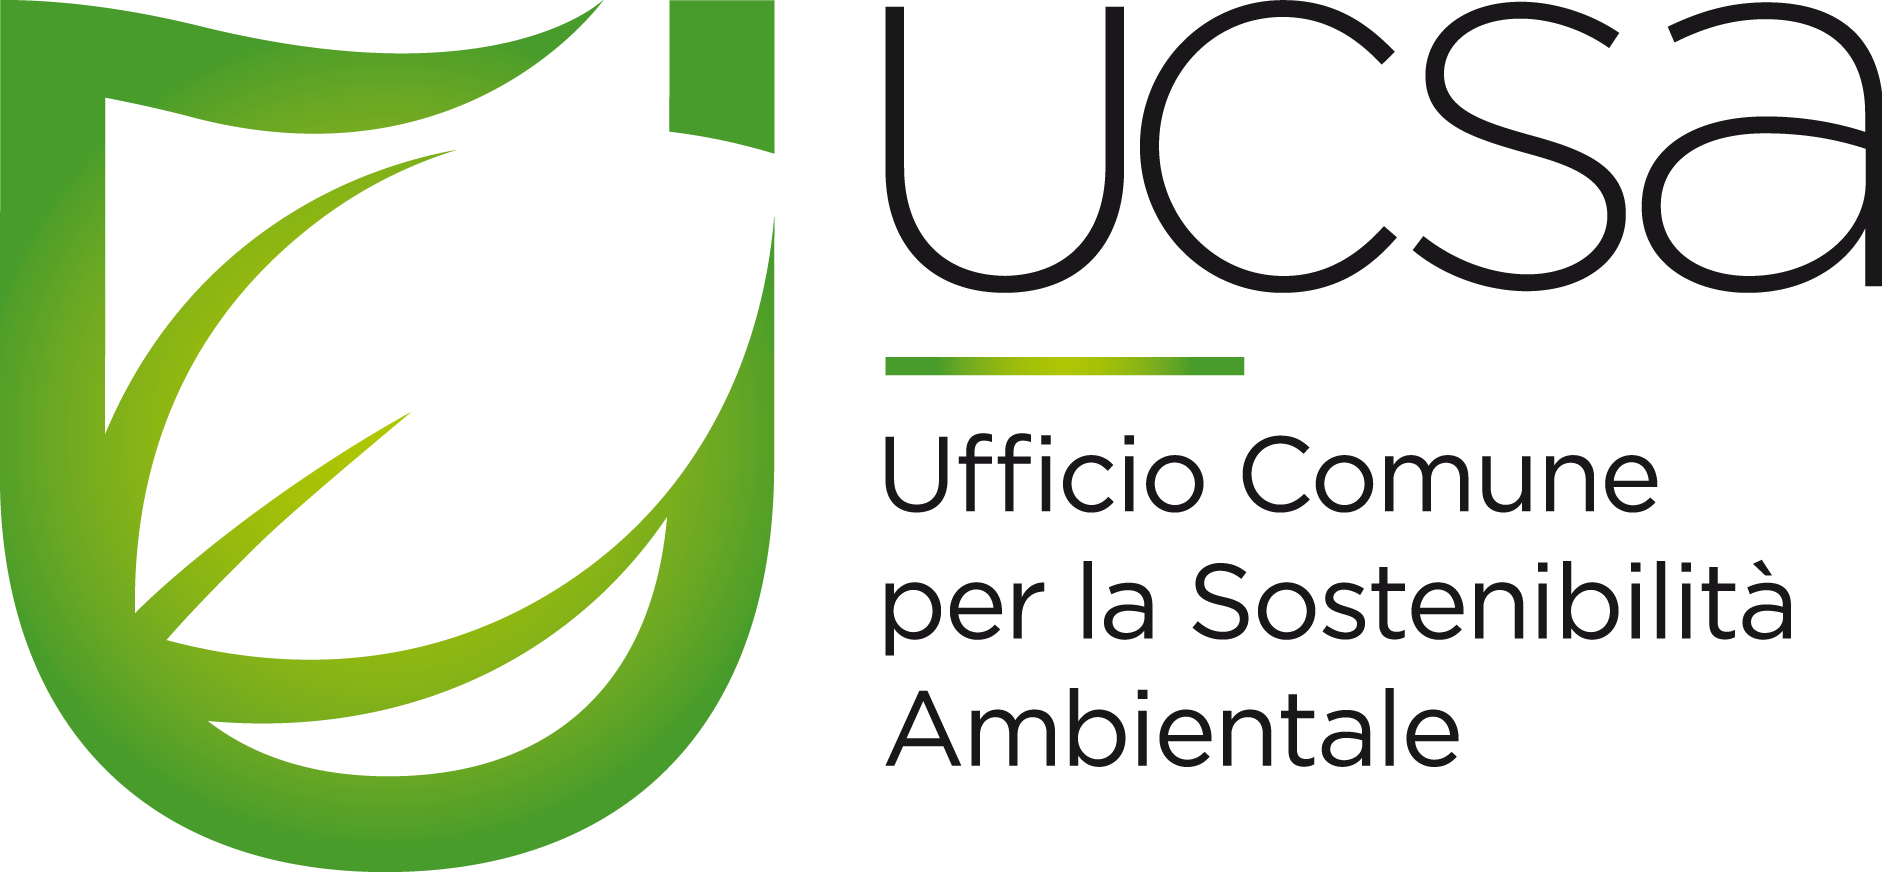 UCSA-logo-orizzontale-sfumato.png